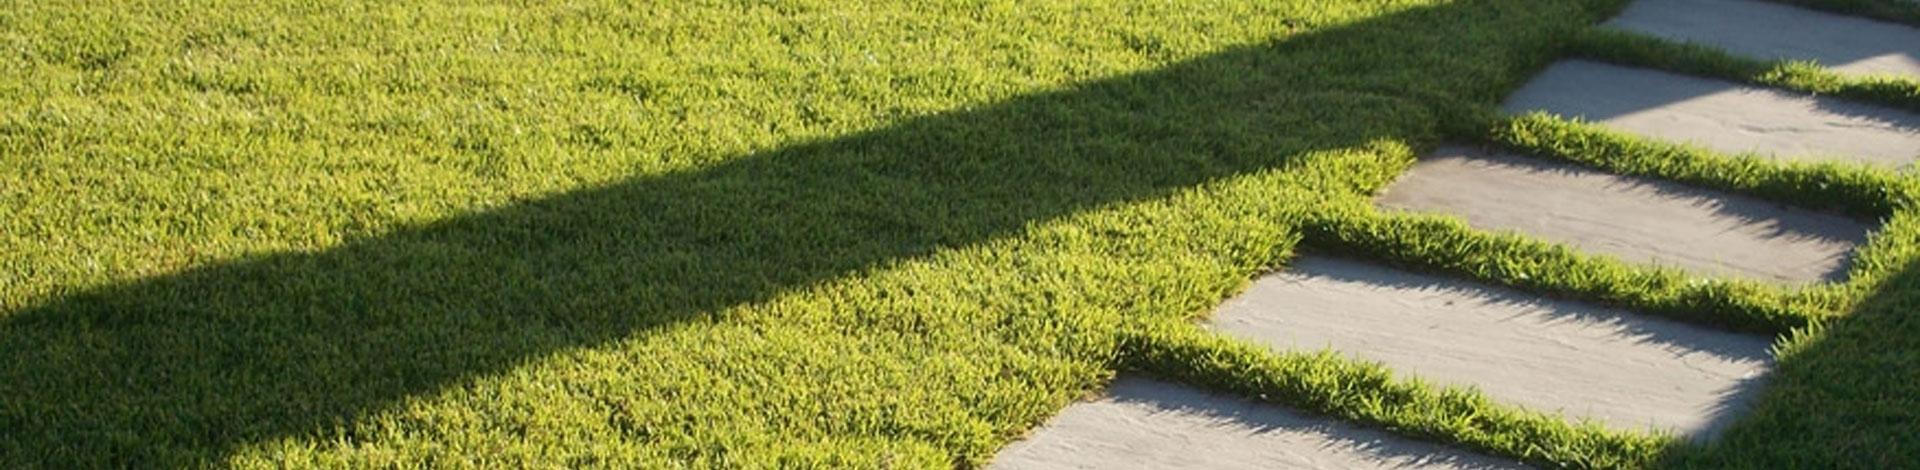 Pavimenti esterni pavimenti giardino pavimentazione - Pavimentazione giardino ...